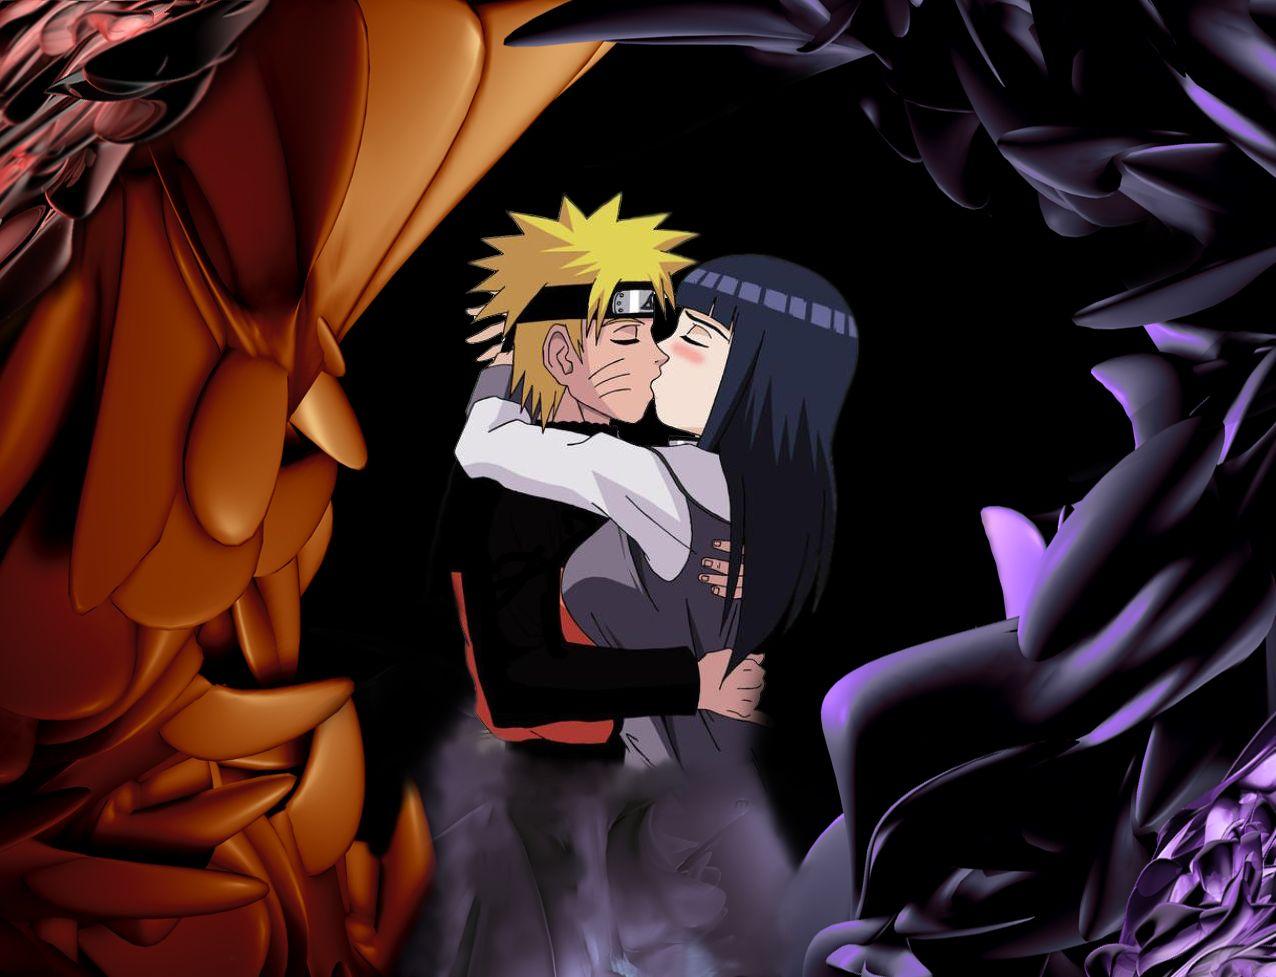 Naruto Wallpaper By Zuket Creation Hd Anime Wallpapers Naruto Wallpaper Naruto Wallpaper Iphone